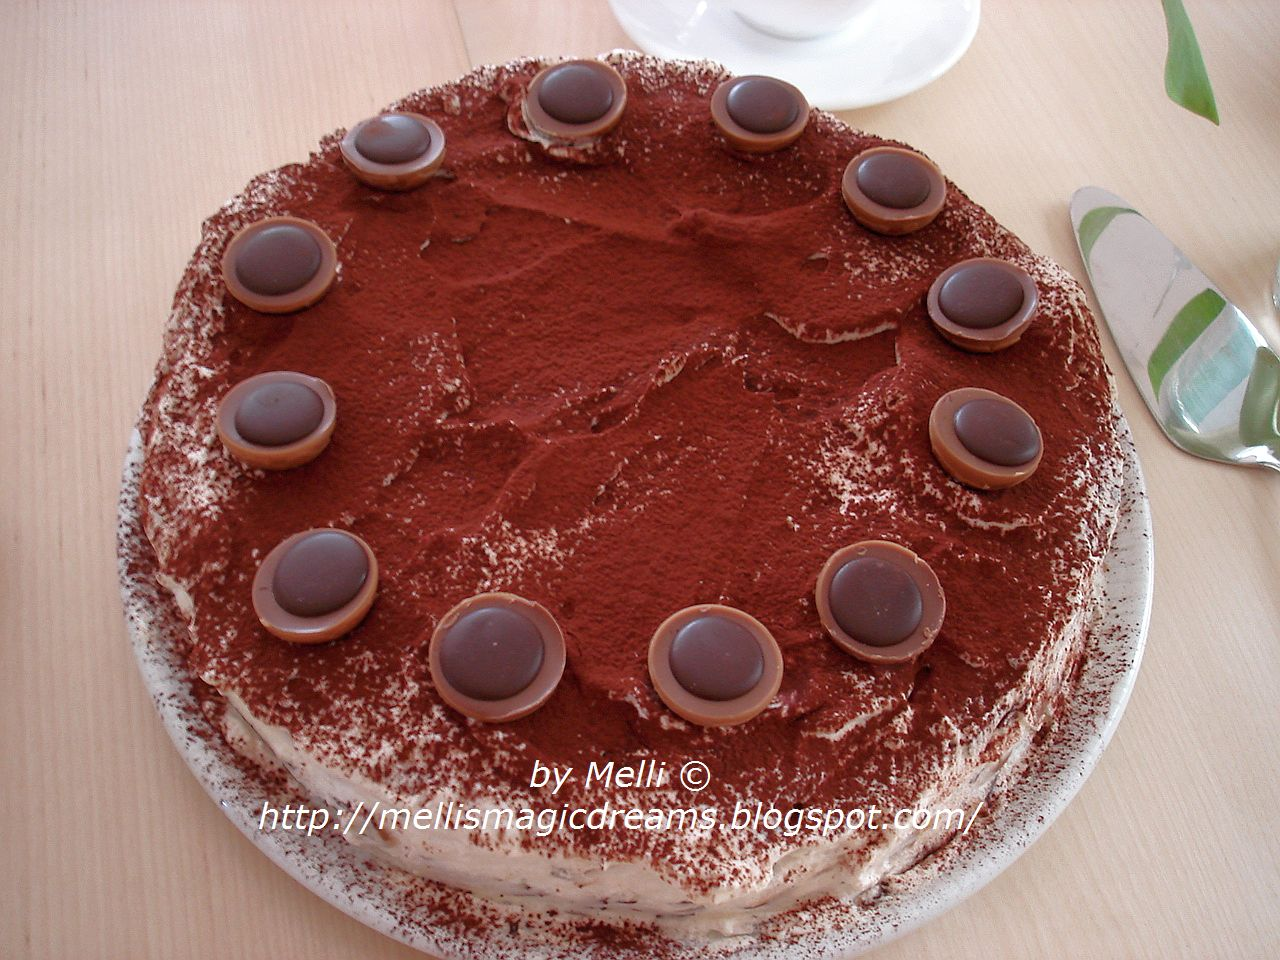 Torte Rezepte Per Embelsira Aguea Kuzhina Shqiptare Picture